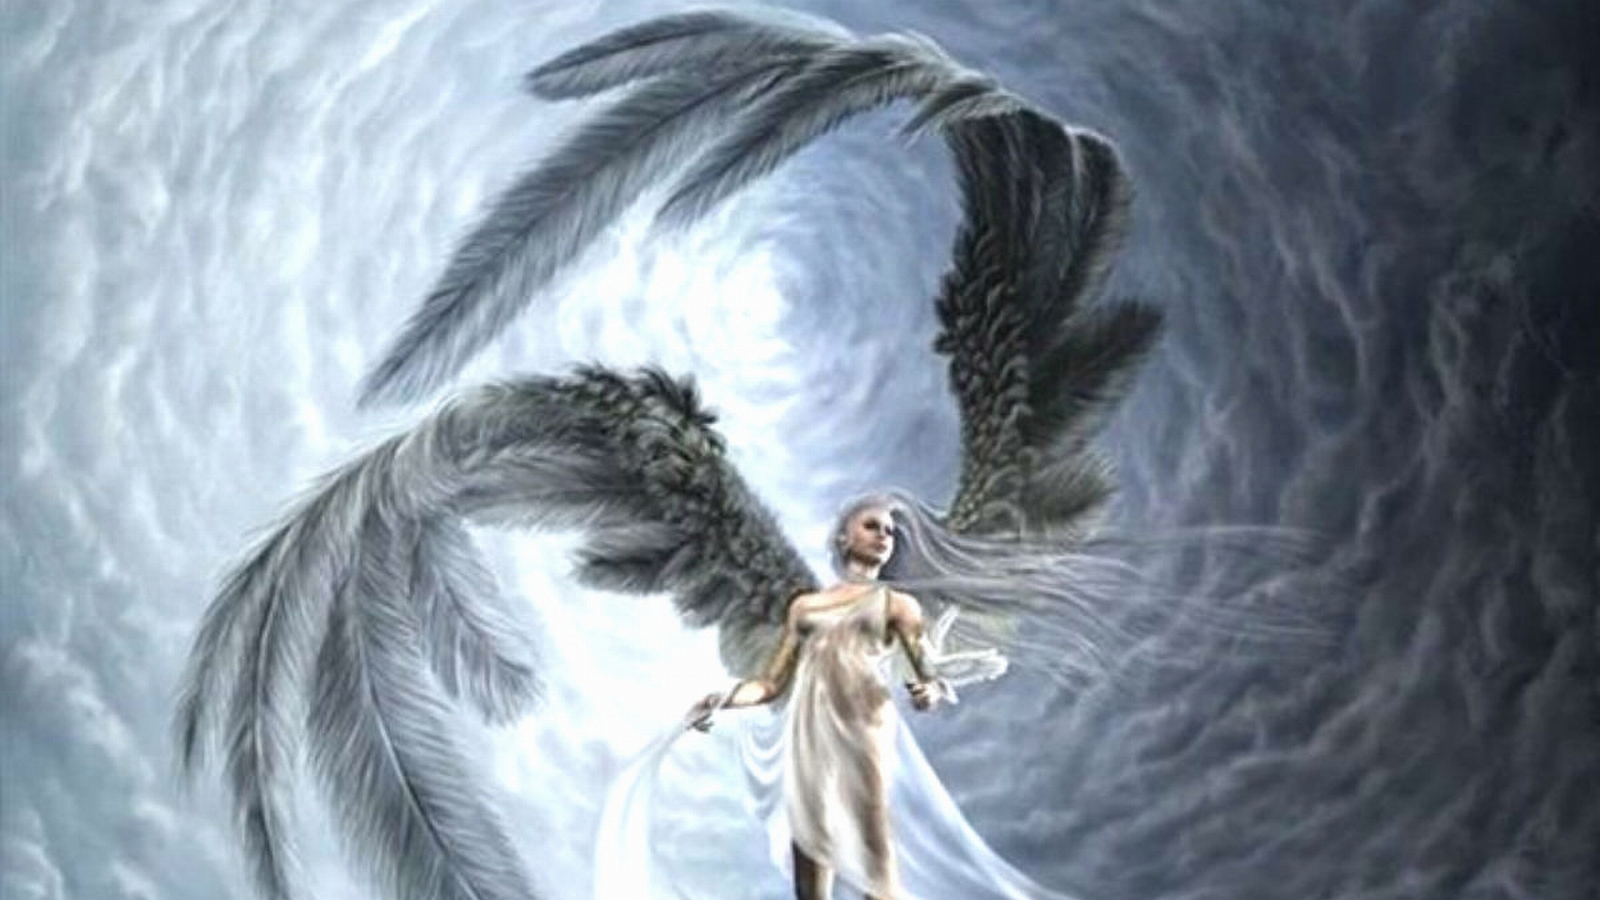 Free Download Mx 766 Angel Wallpaper Angel Adorable Desktop Photos